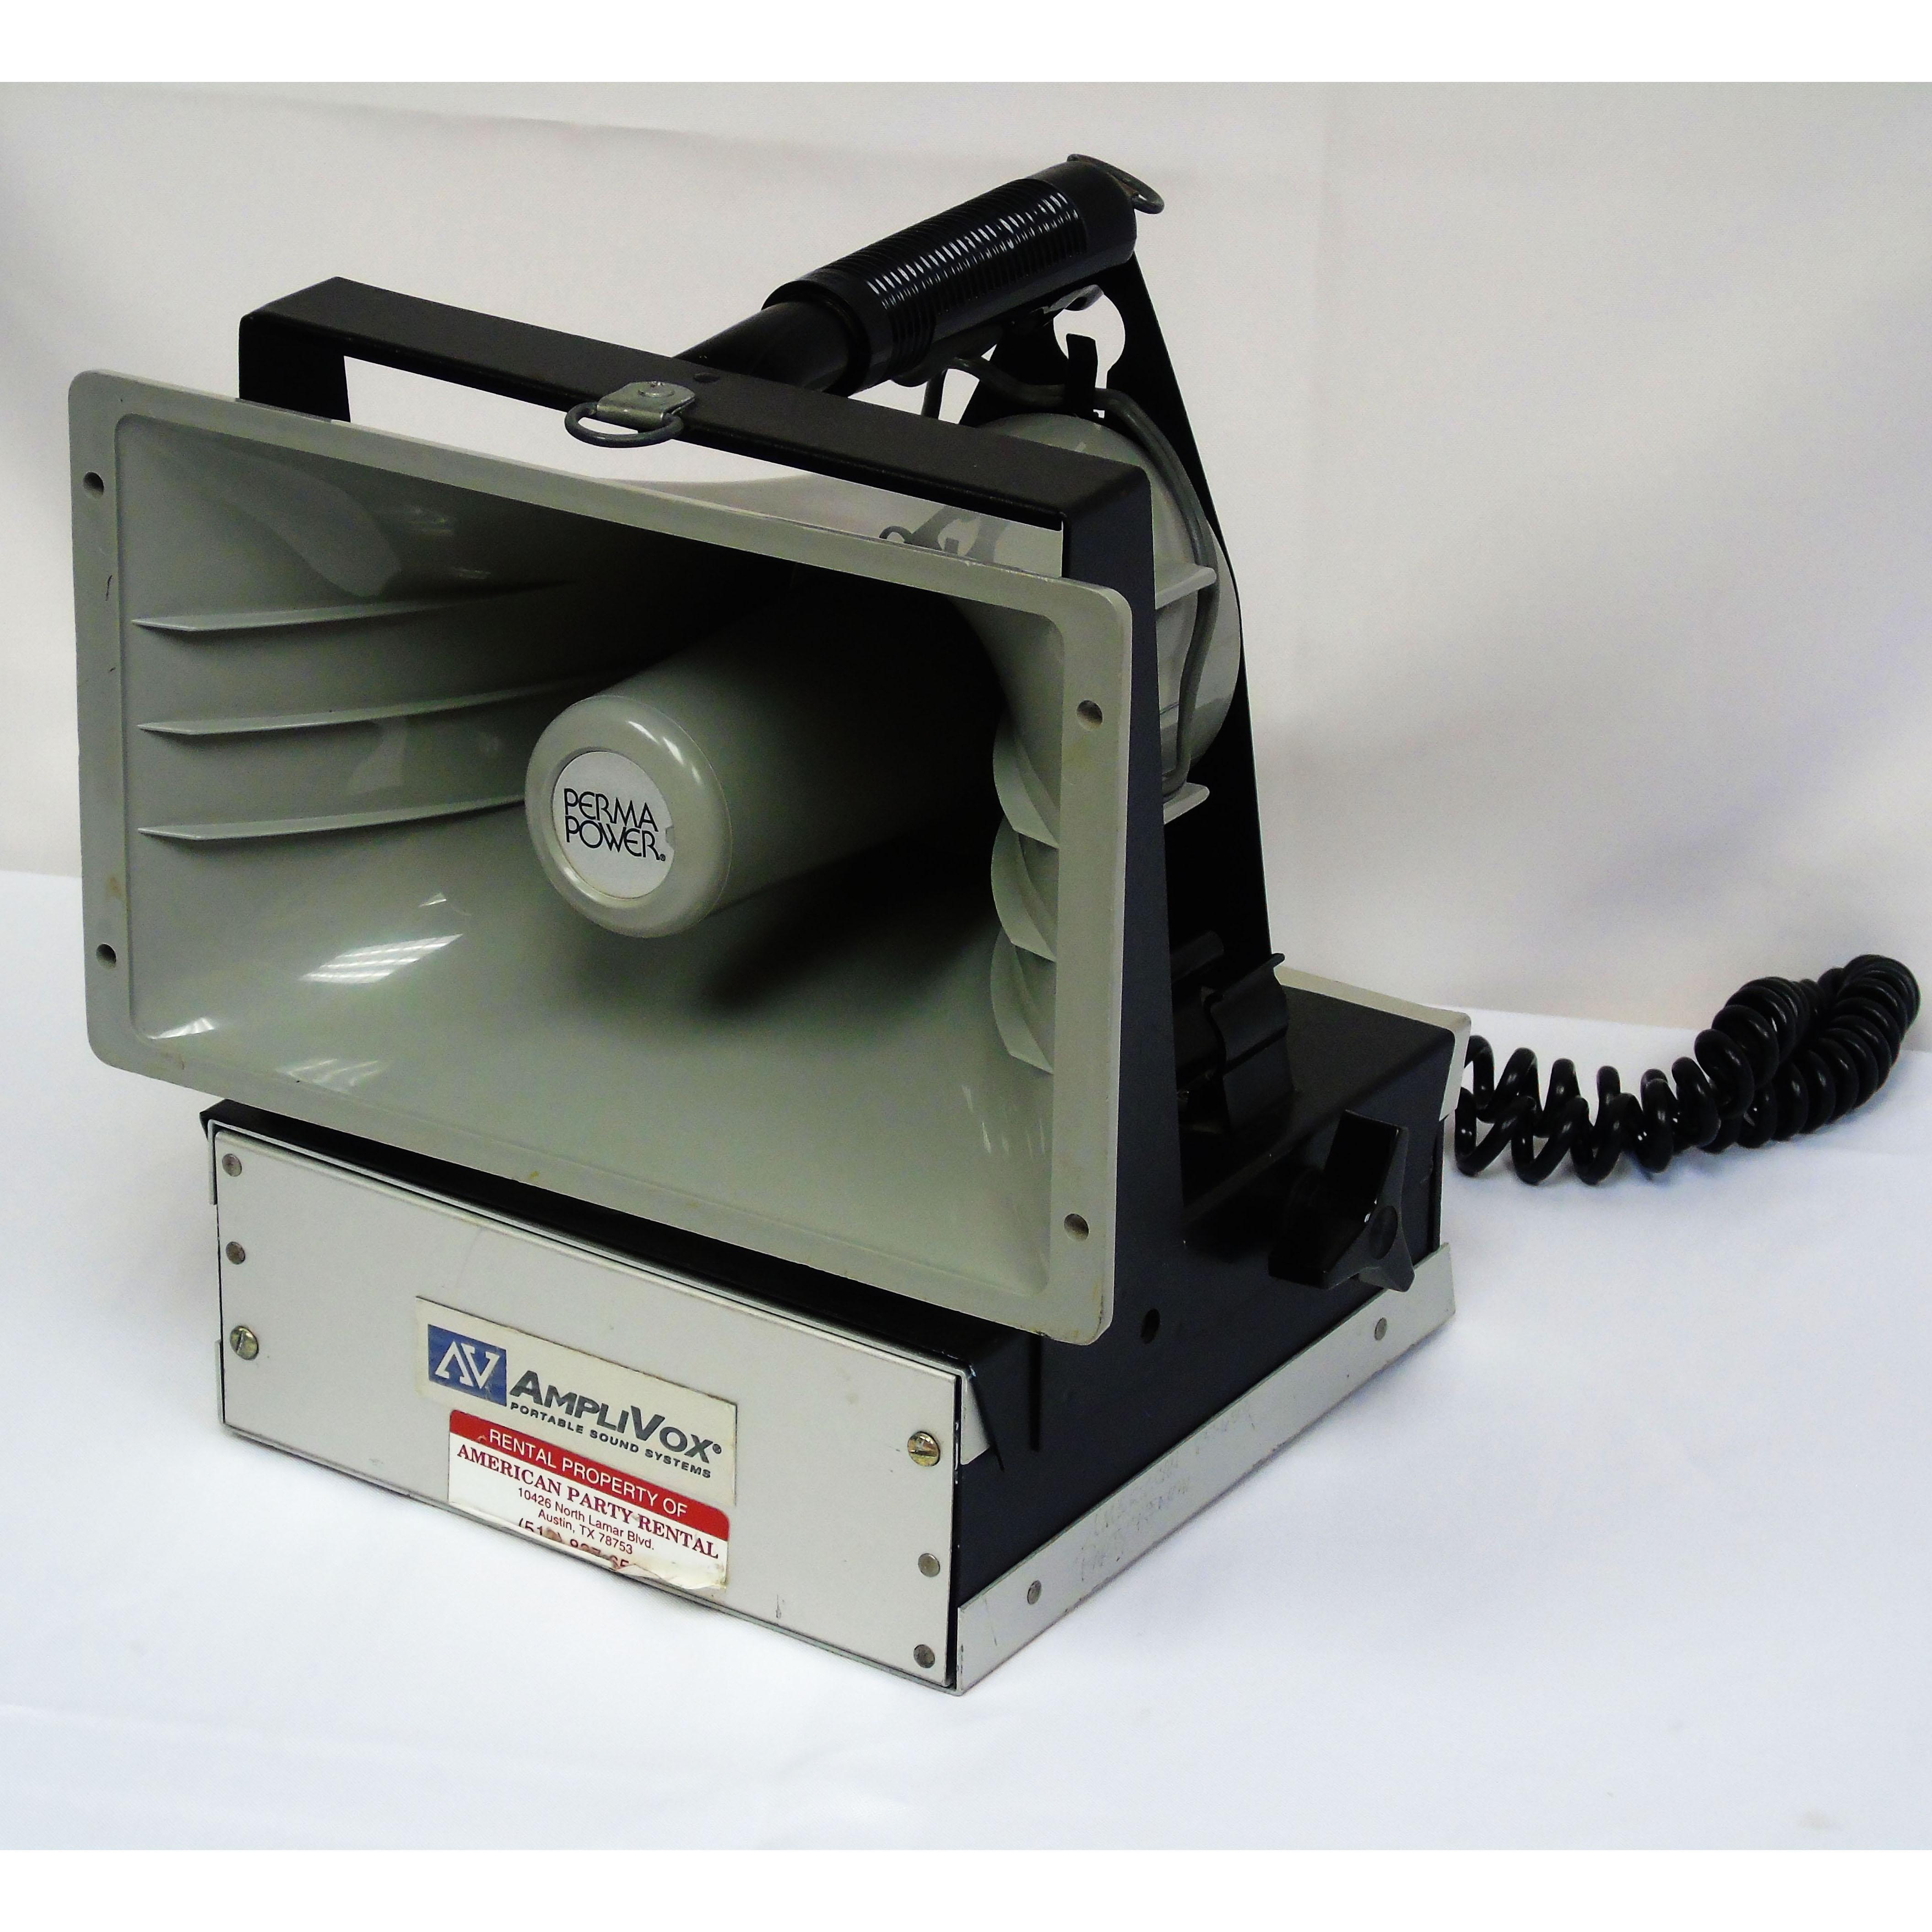 PA System, Portable 1/2 Mile Hailer